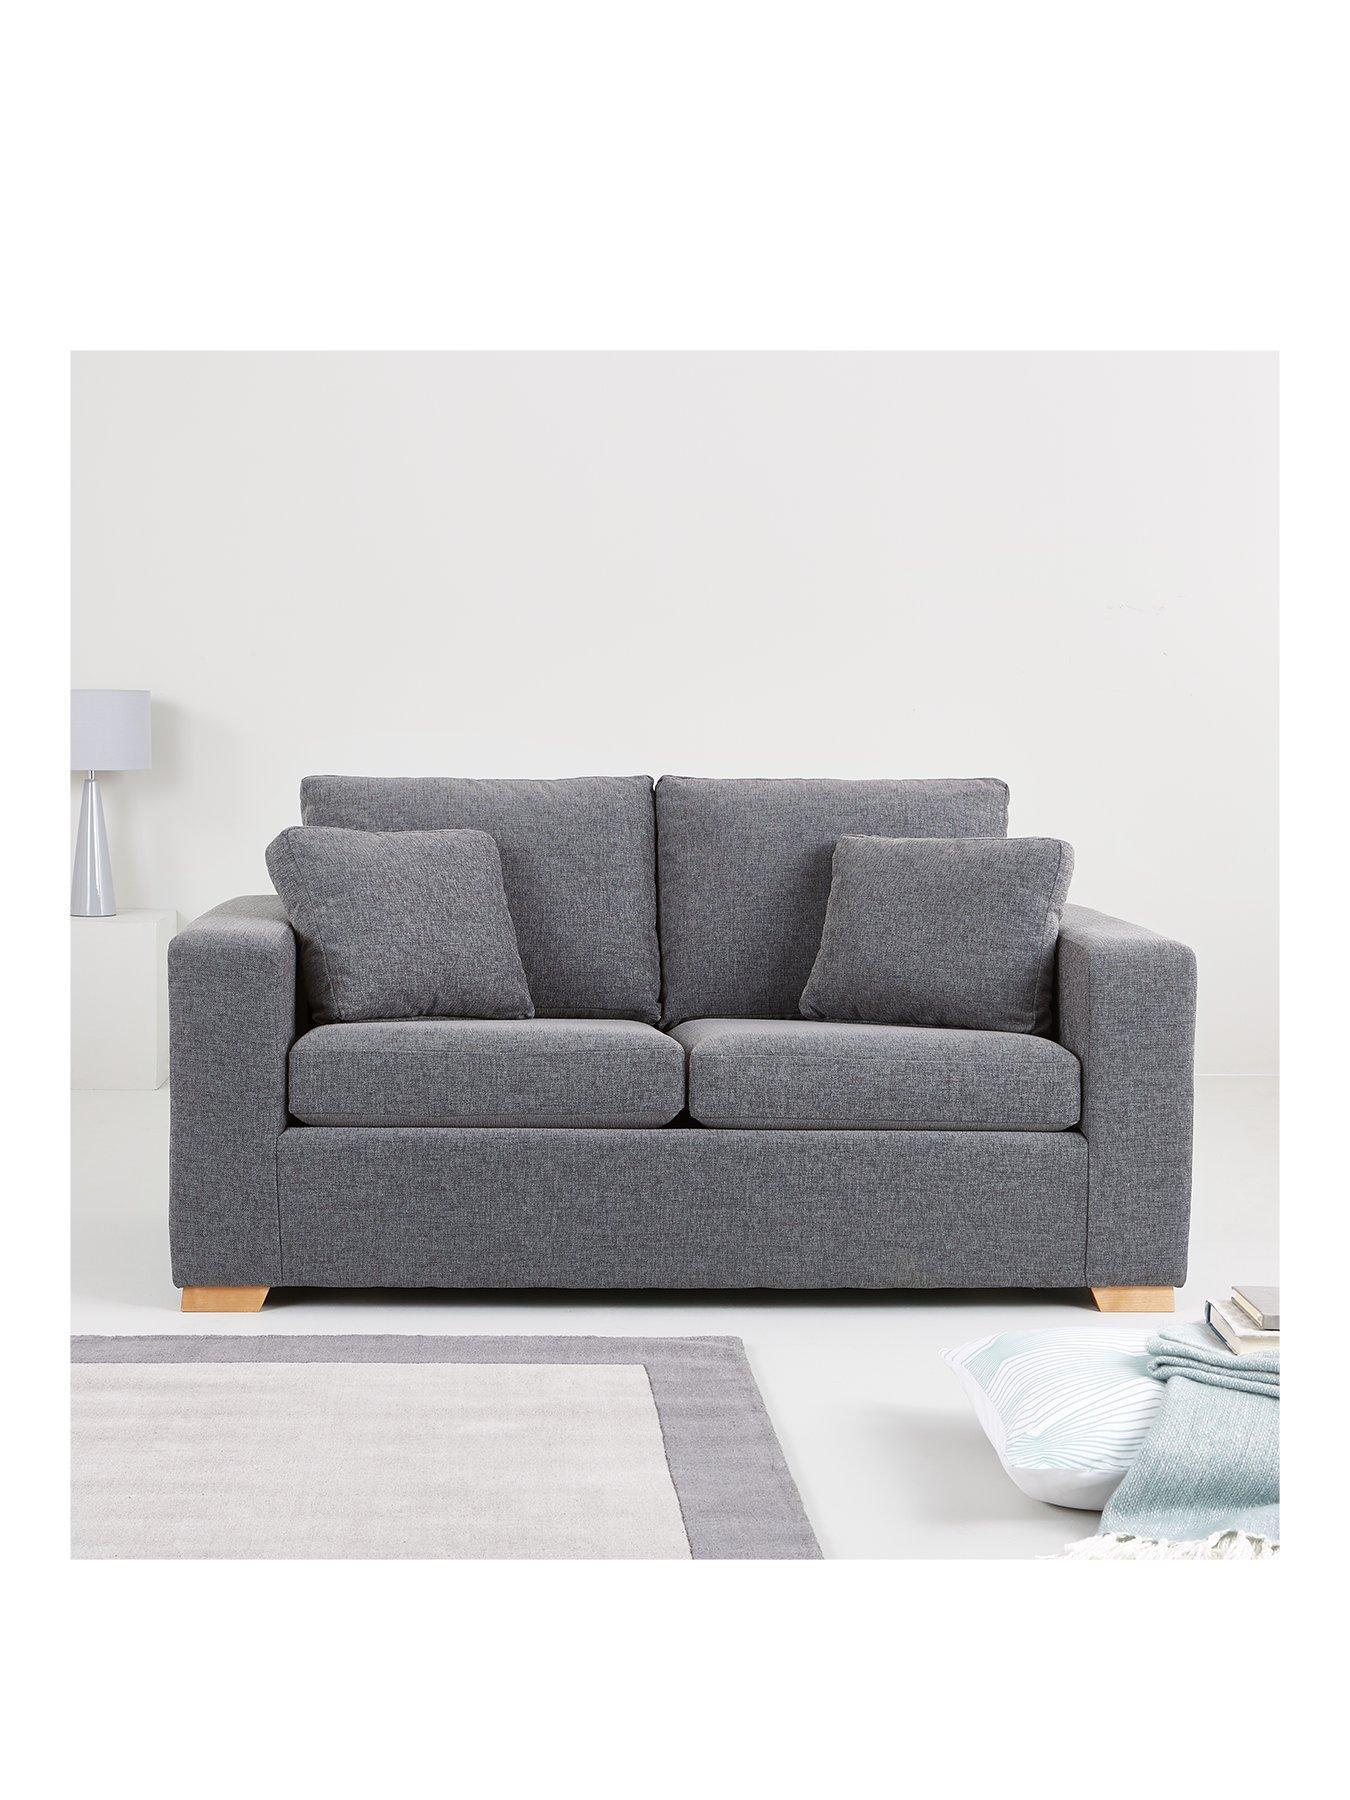 Two Seater | Sofas | Home & garden |